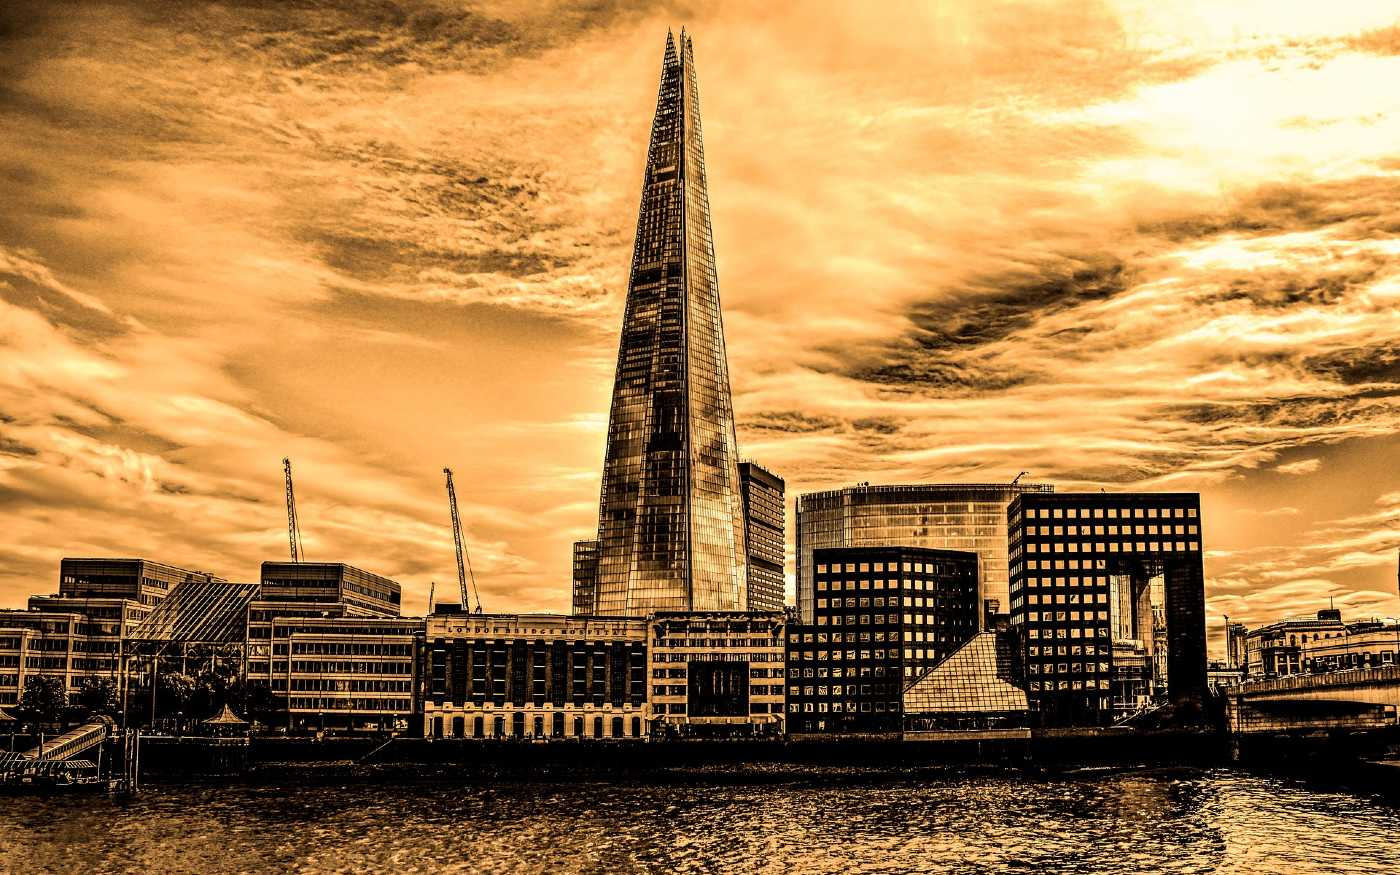 Black and white image of London skyline